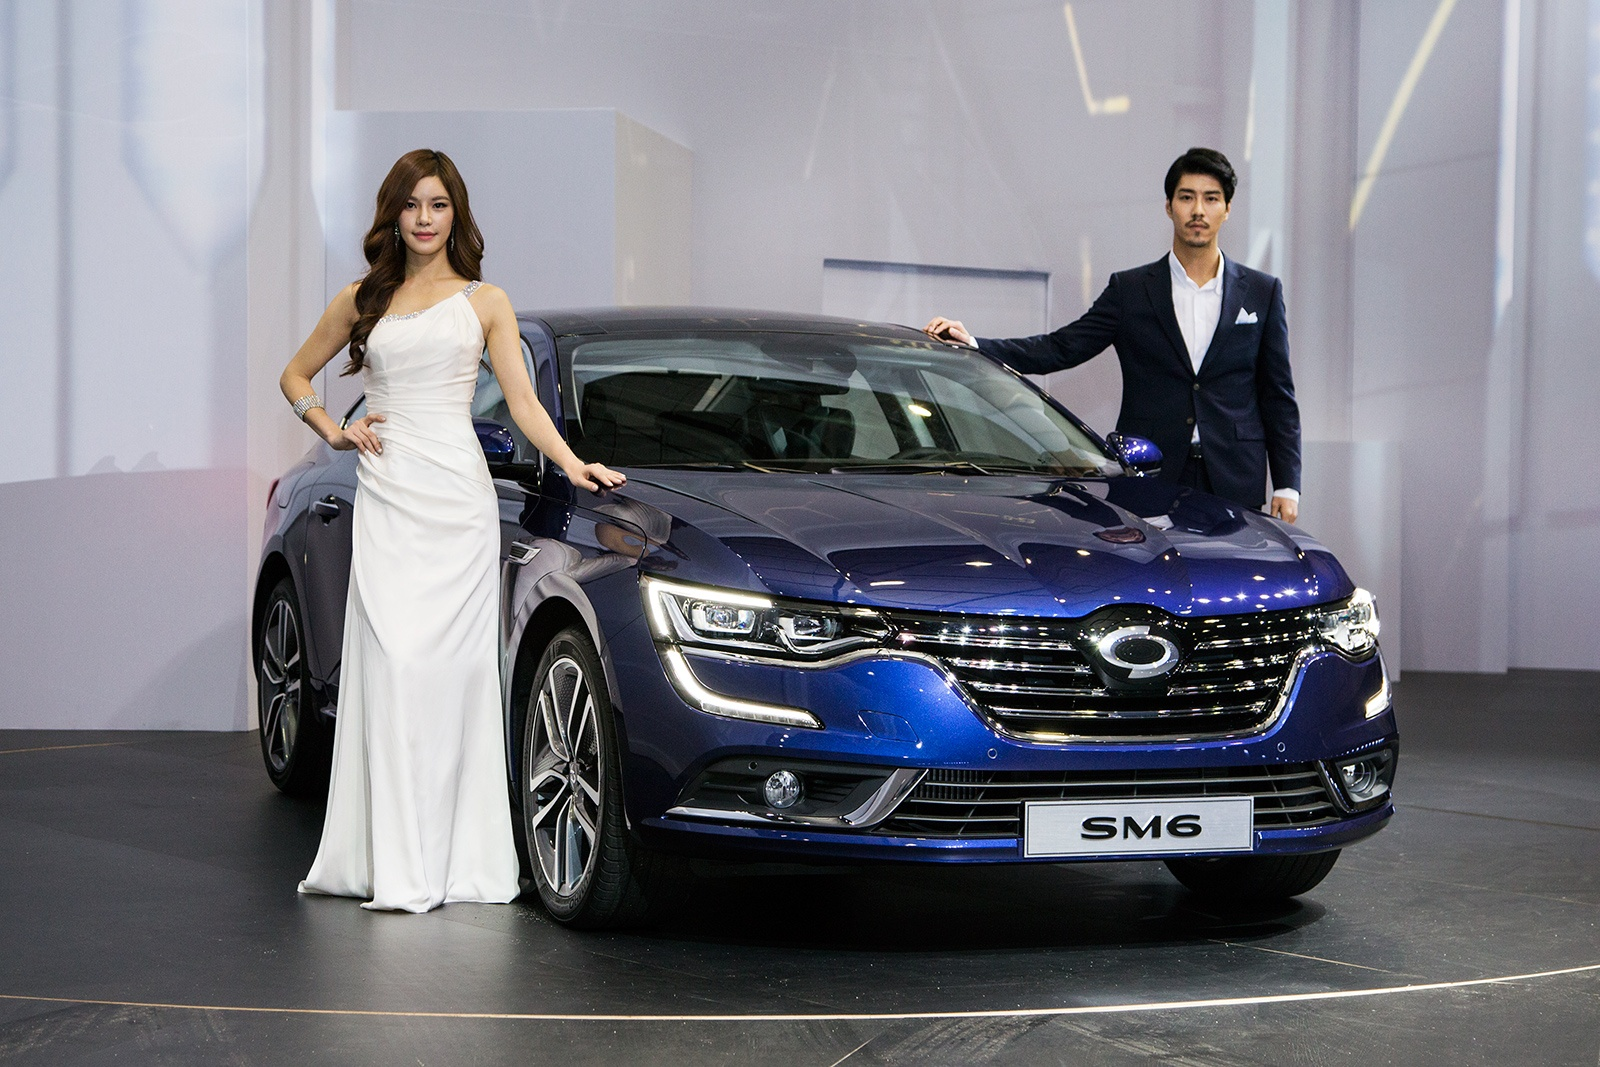 Renault samsung cars